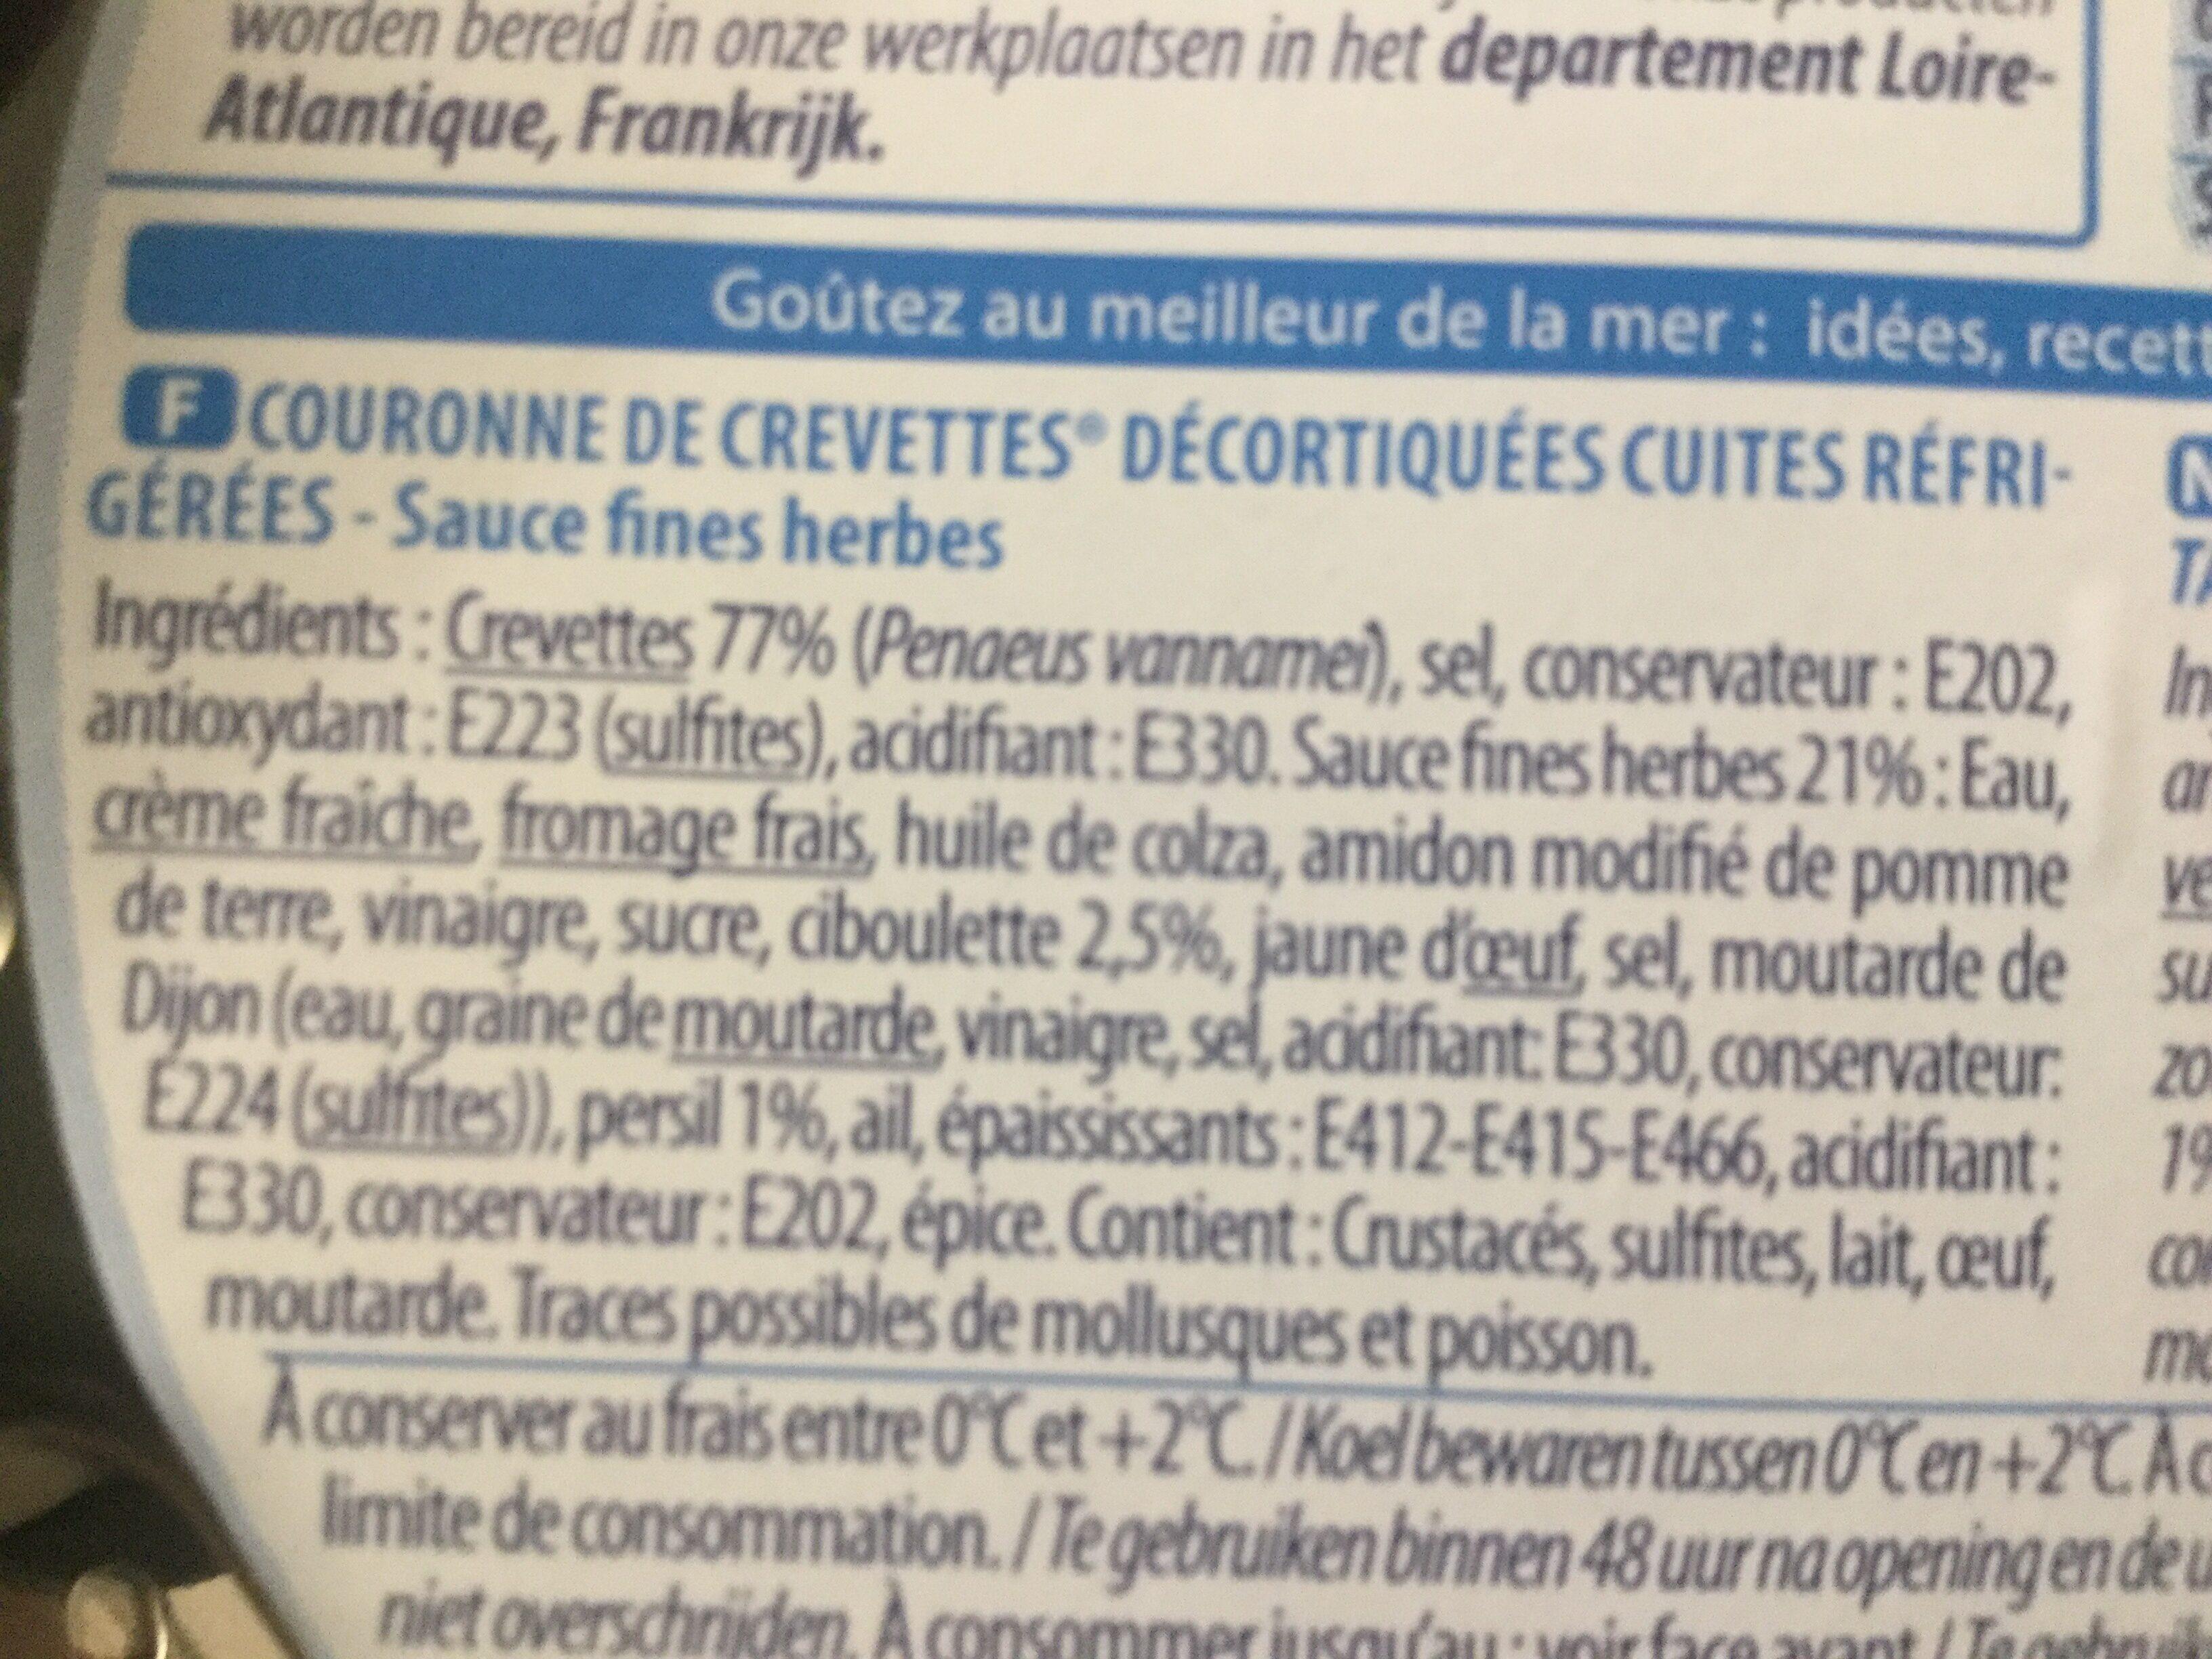 Couronne de crevettes sauce Fines Herbes - Ingrediënten - fr